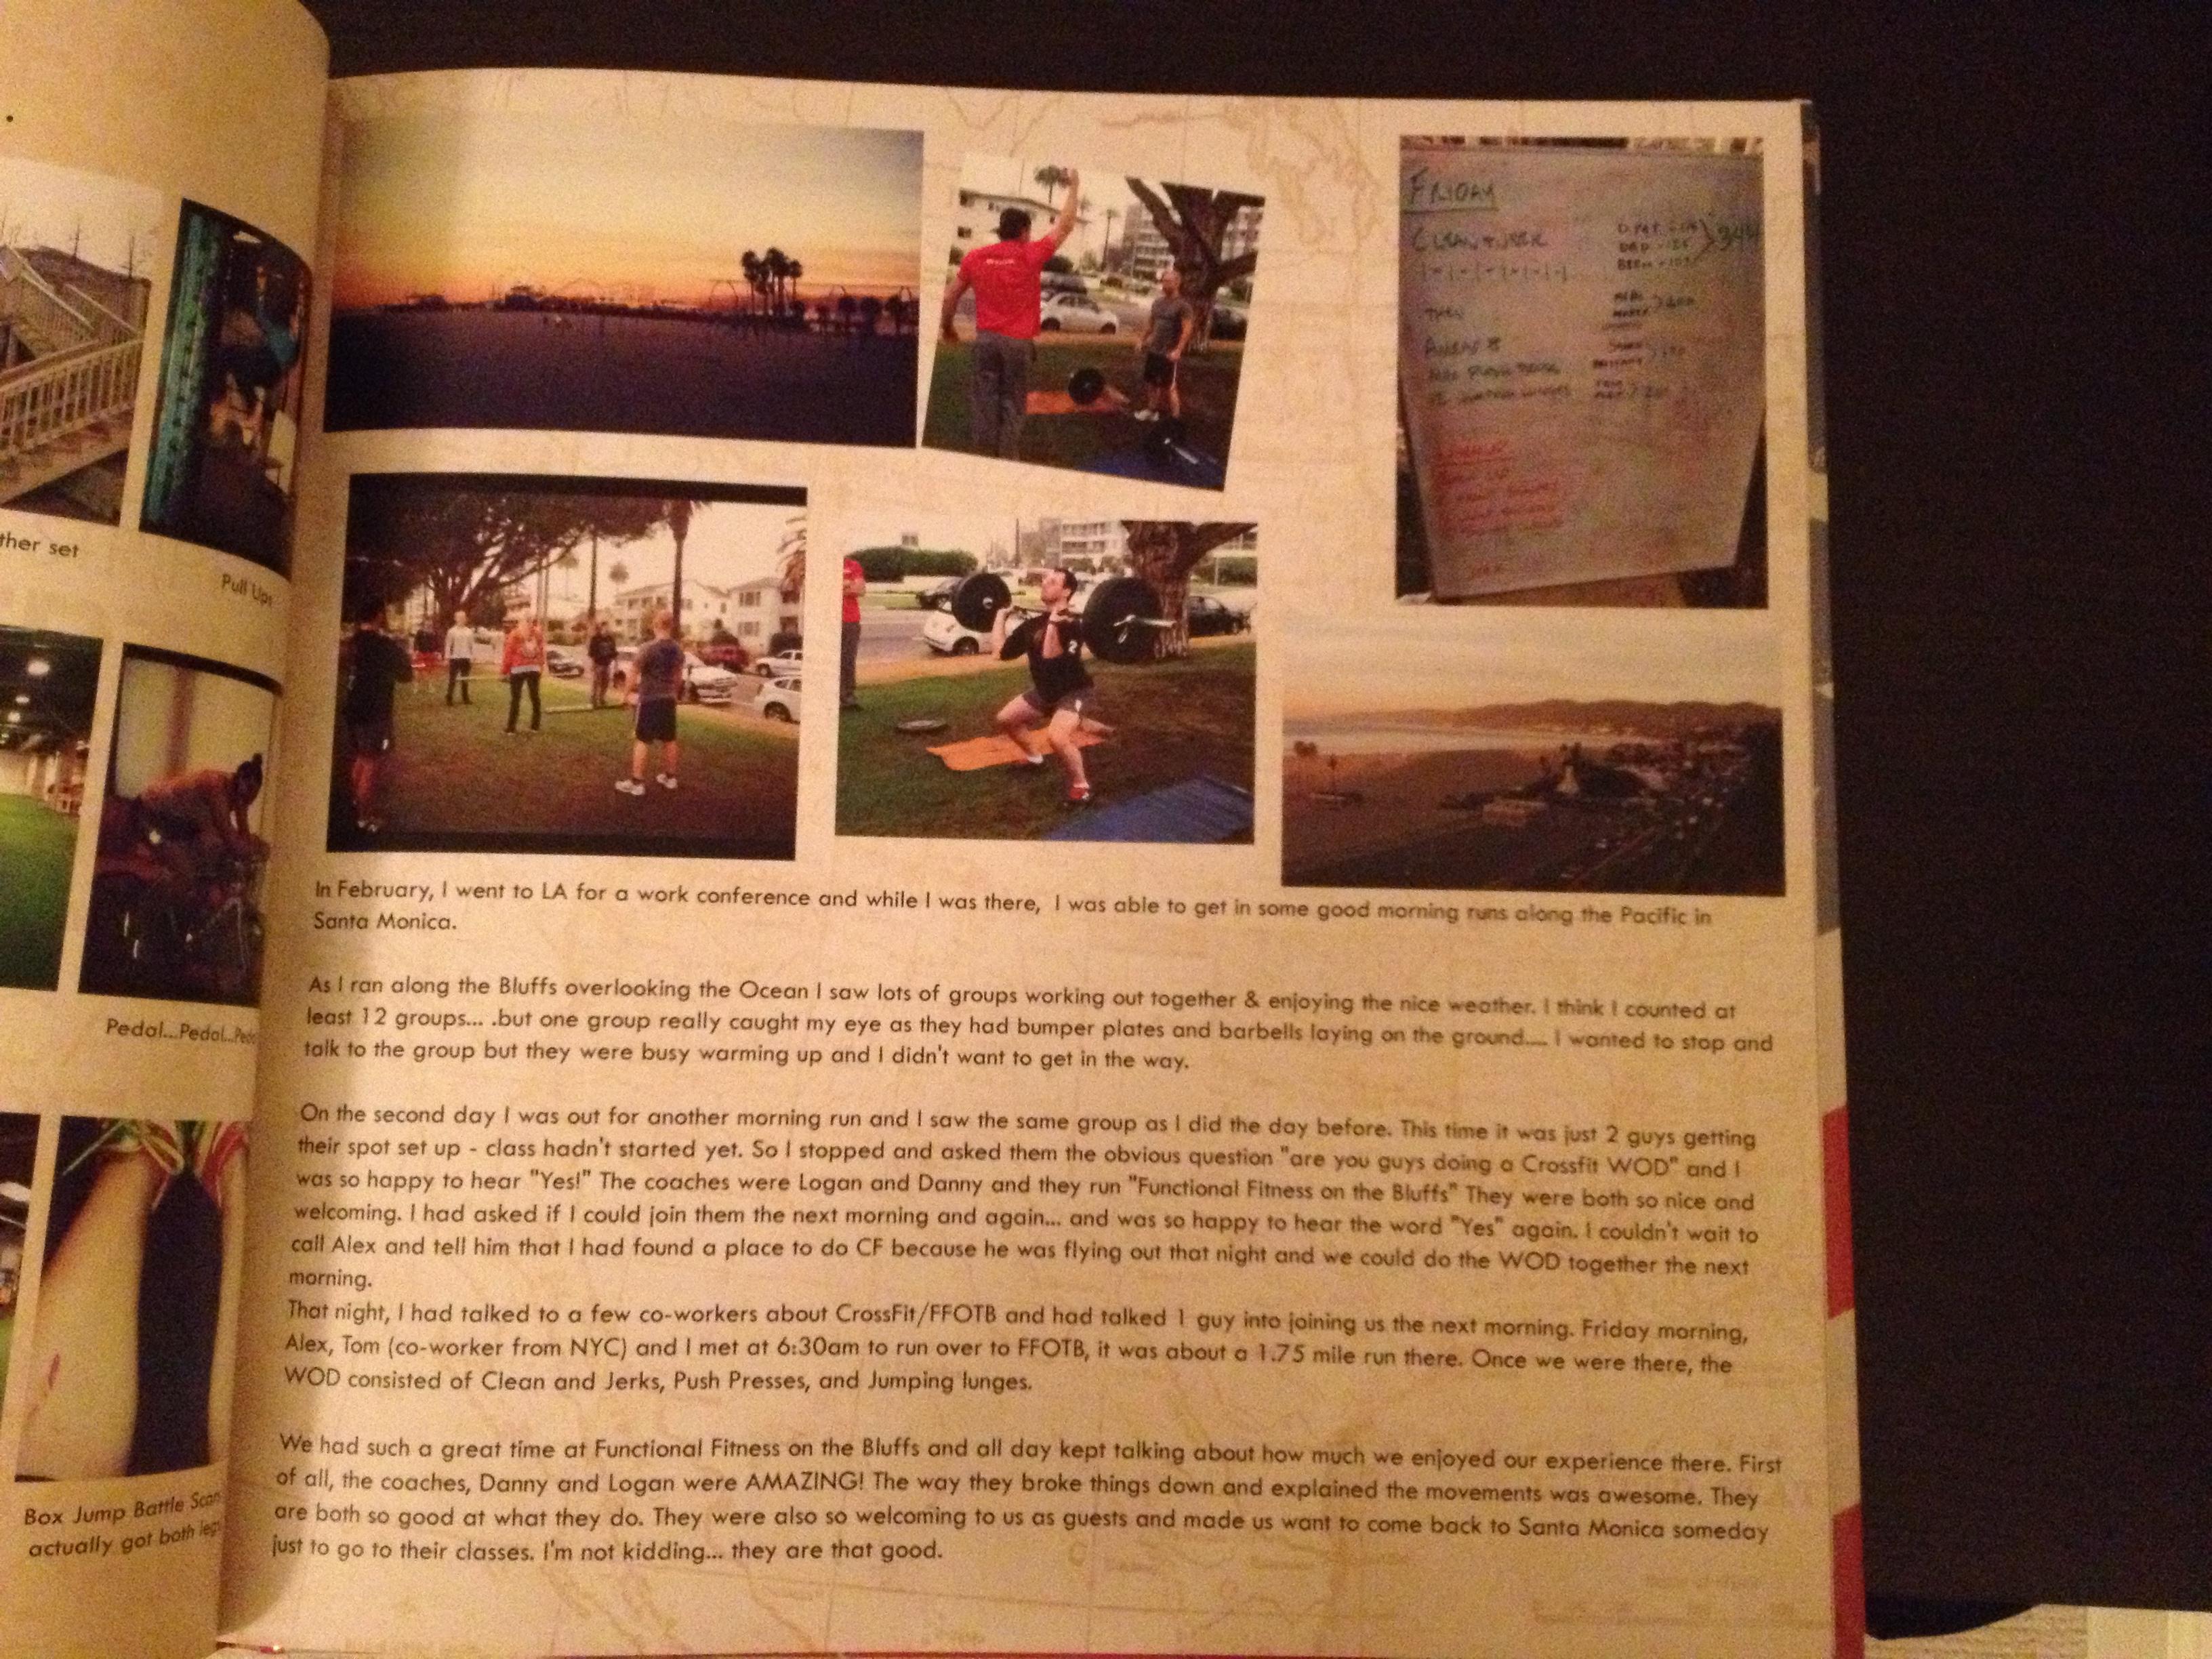 FFOTB makes the Ironman journey scrapbook.